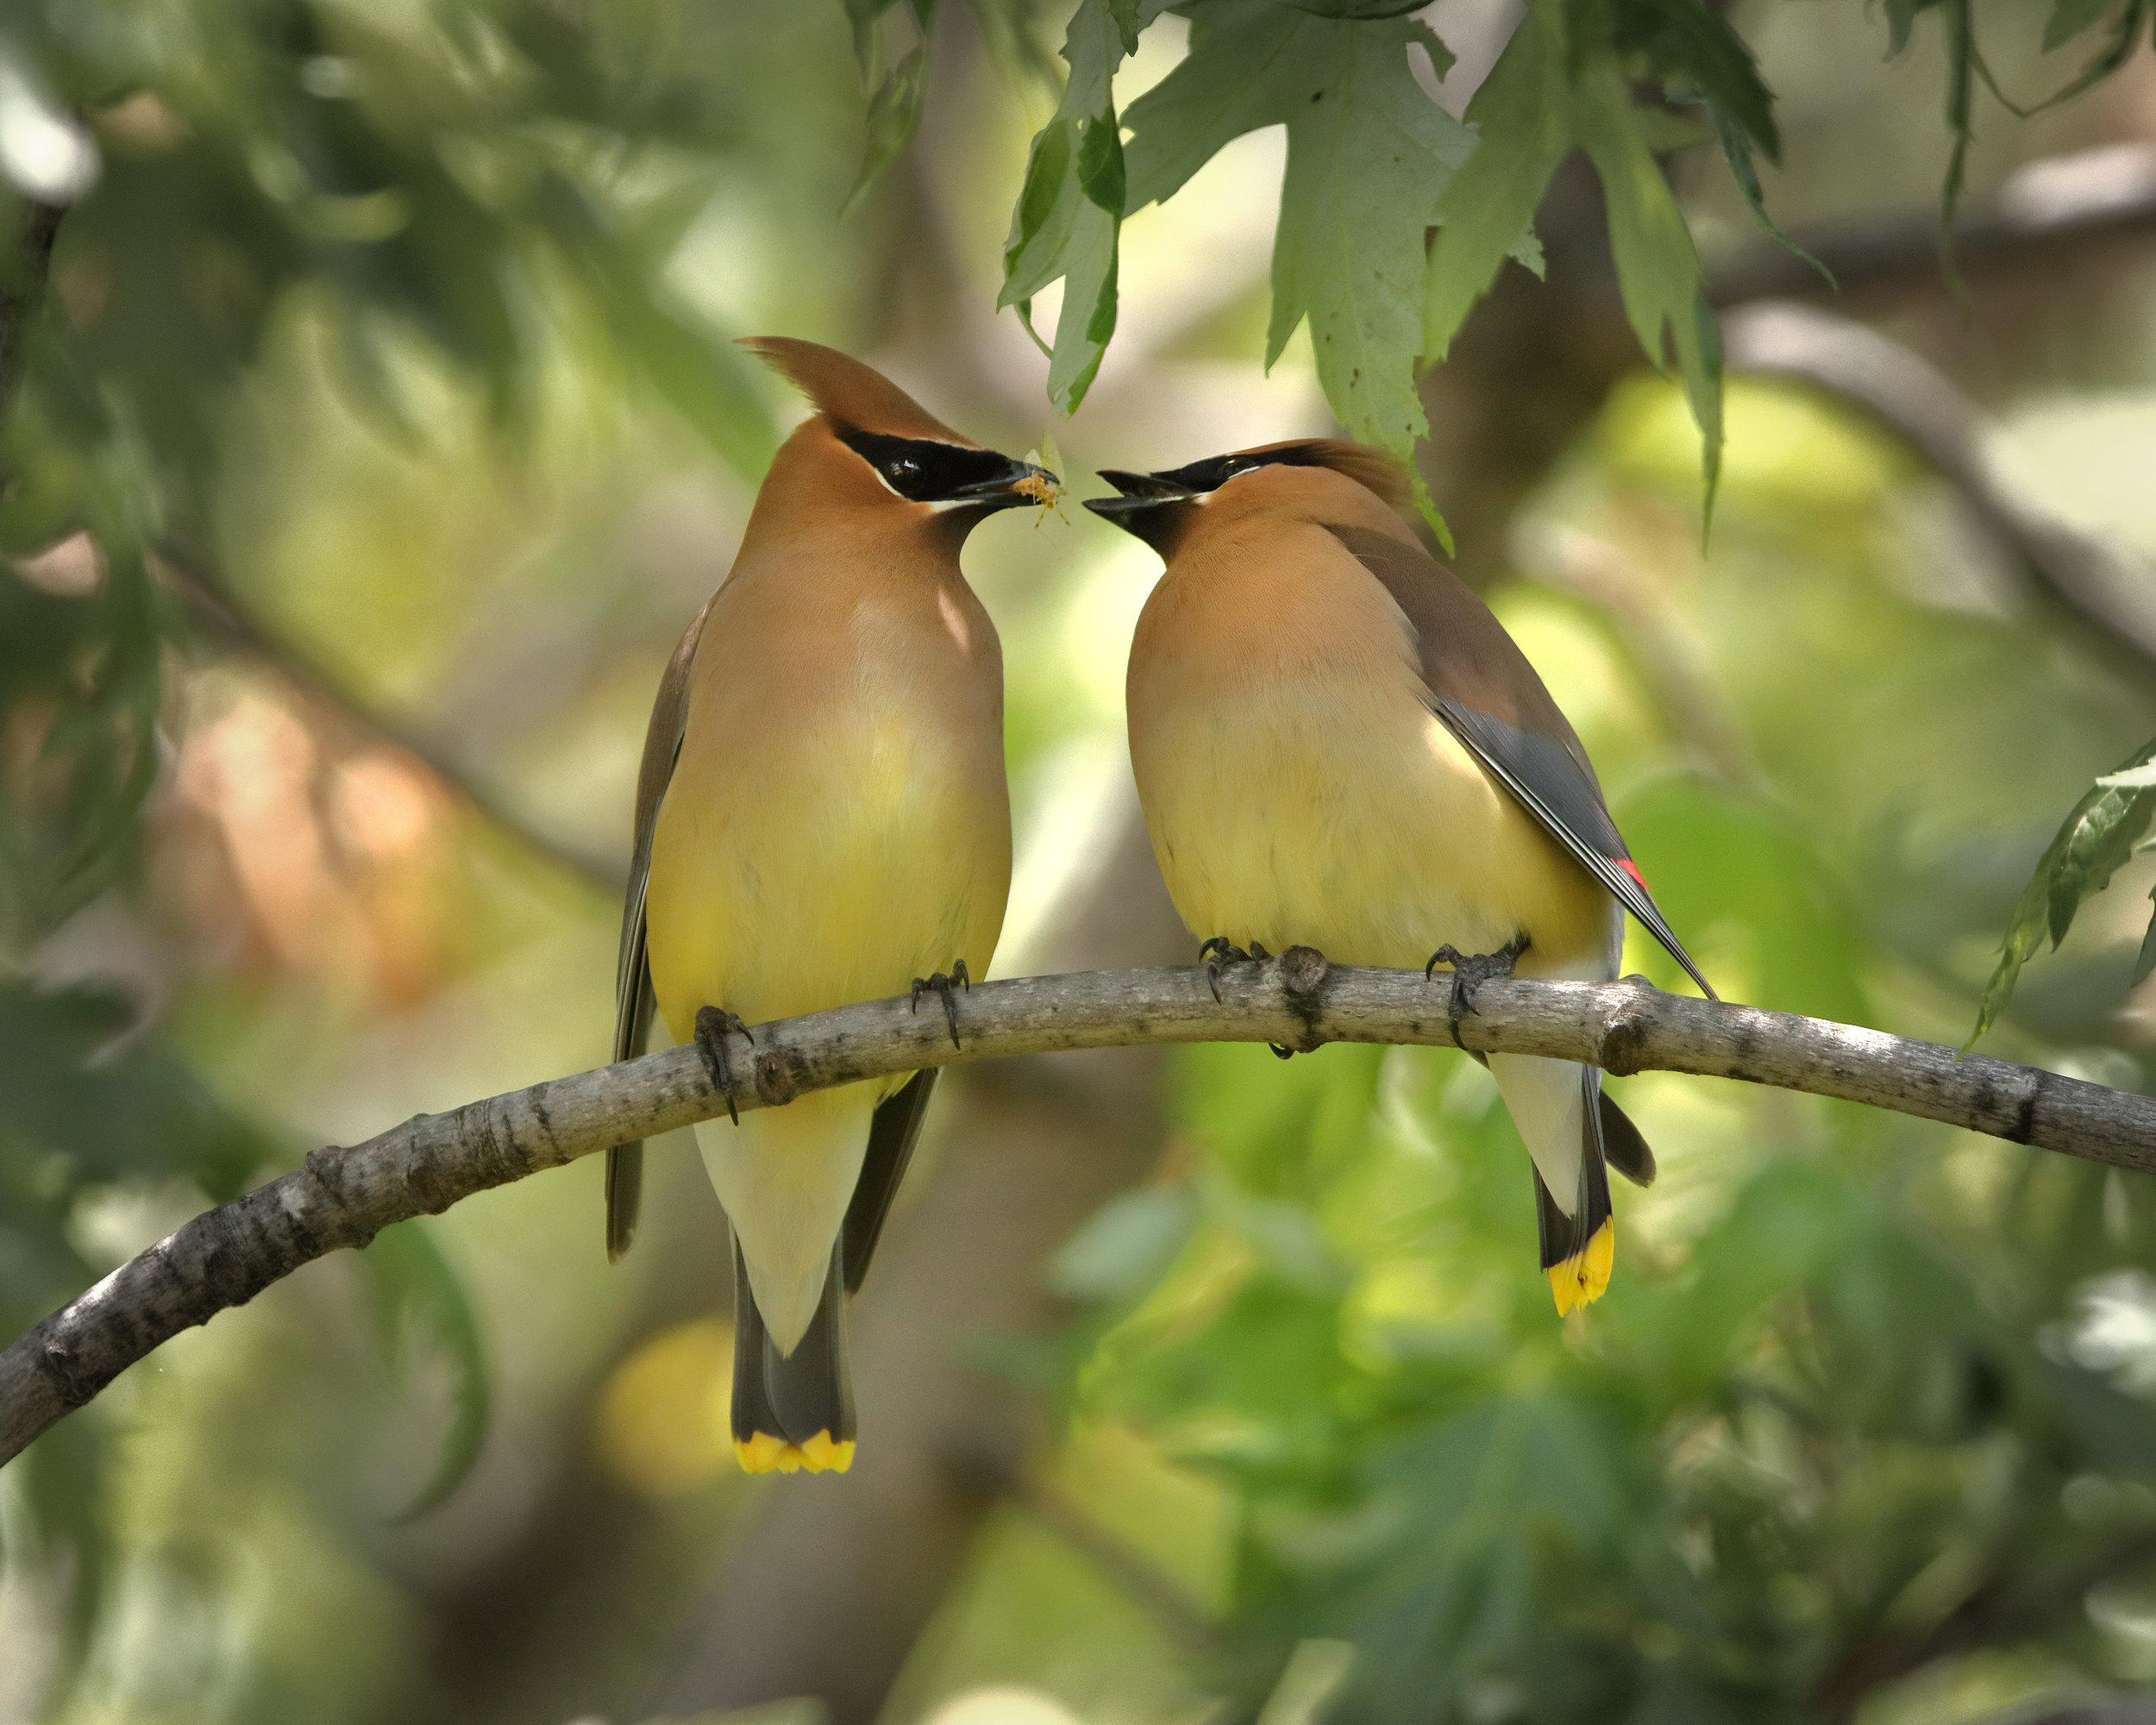 songbirds sharing food